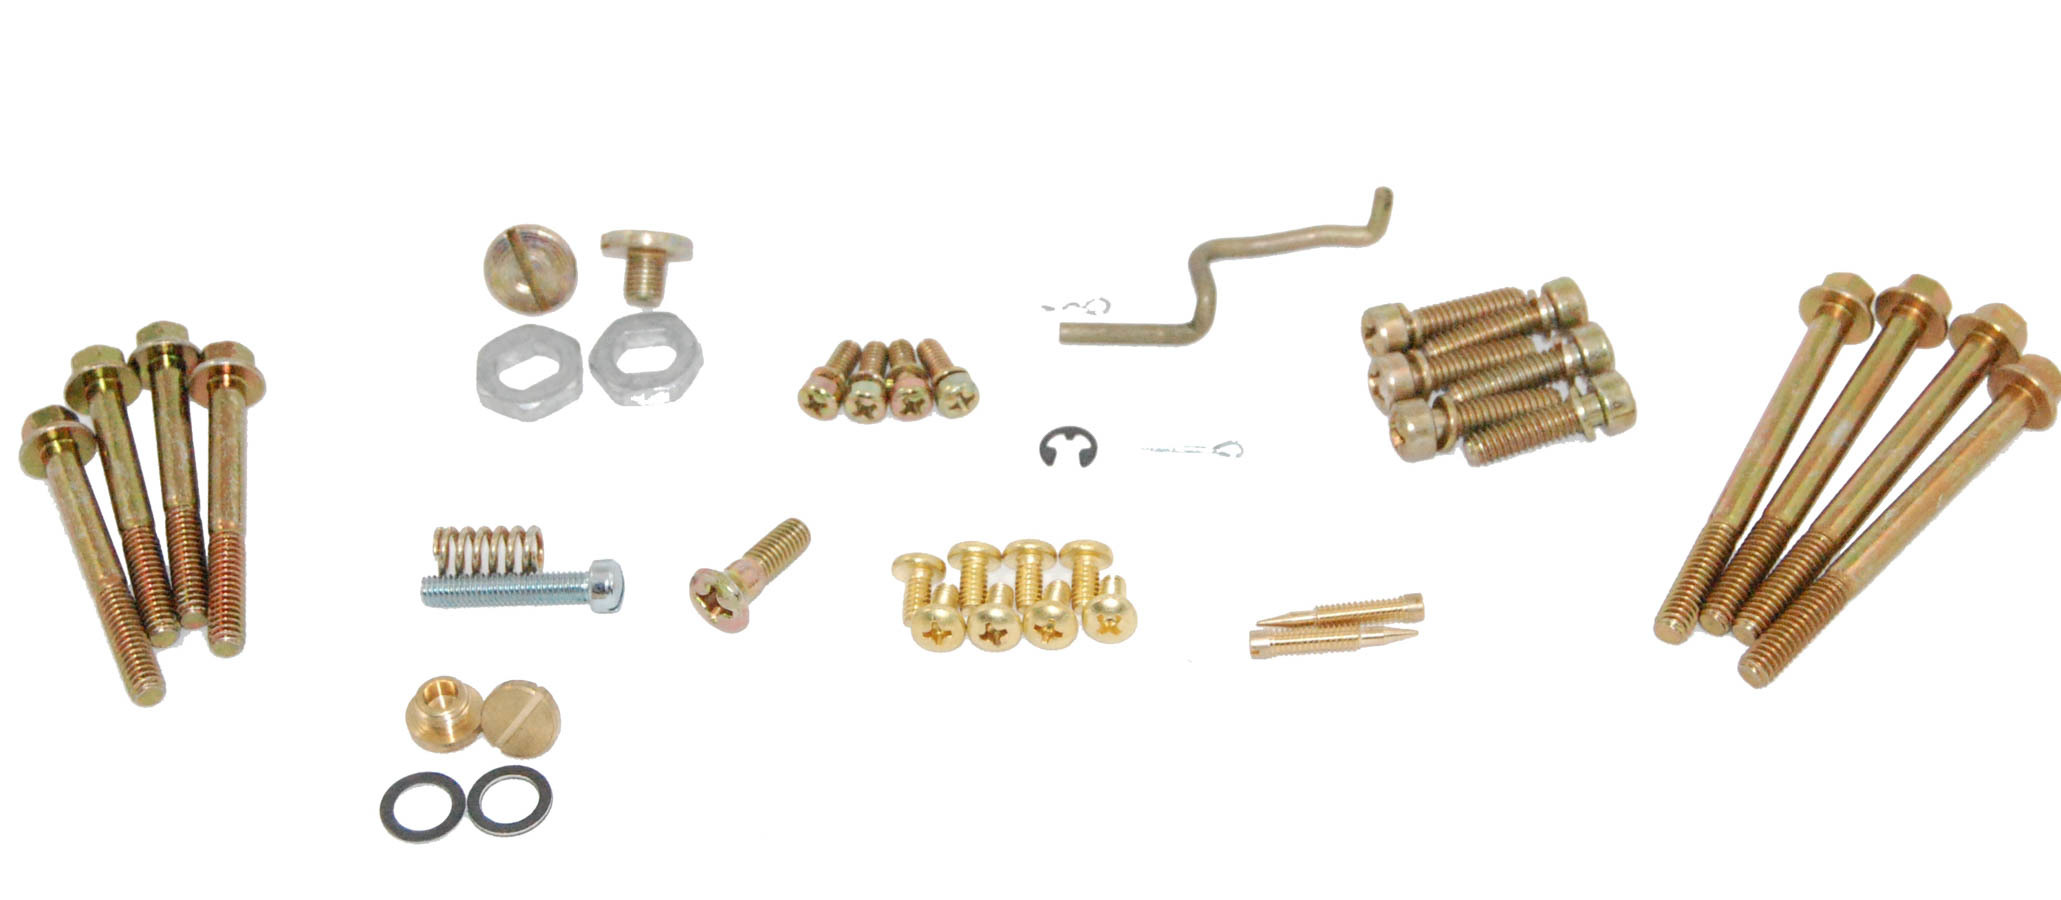 Advanced Engine Design Hardware Kit 4160 Vacuum Secondary Carb